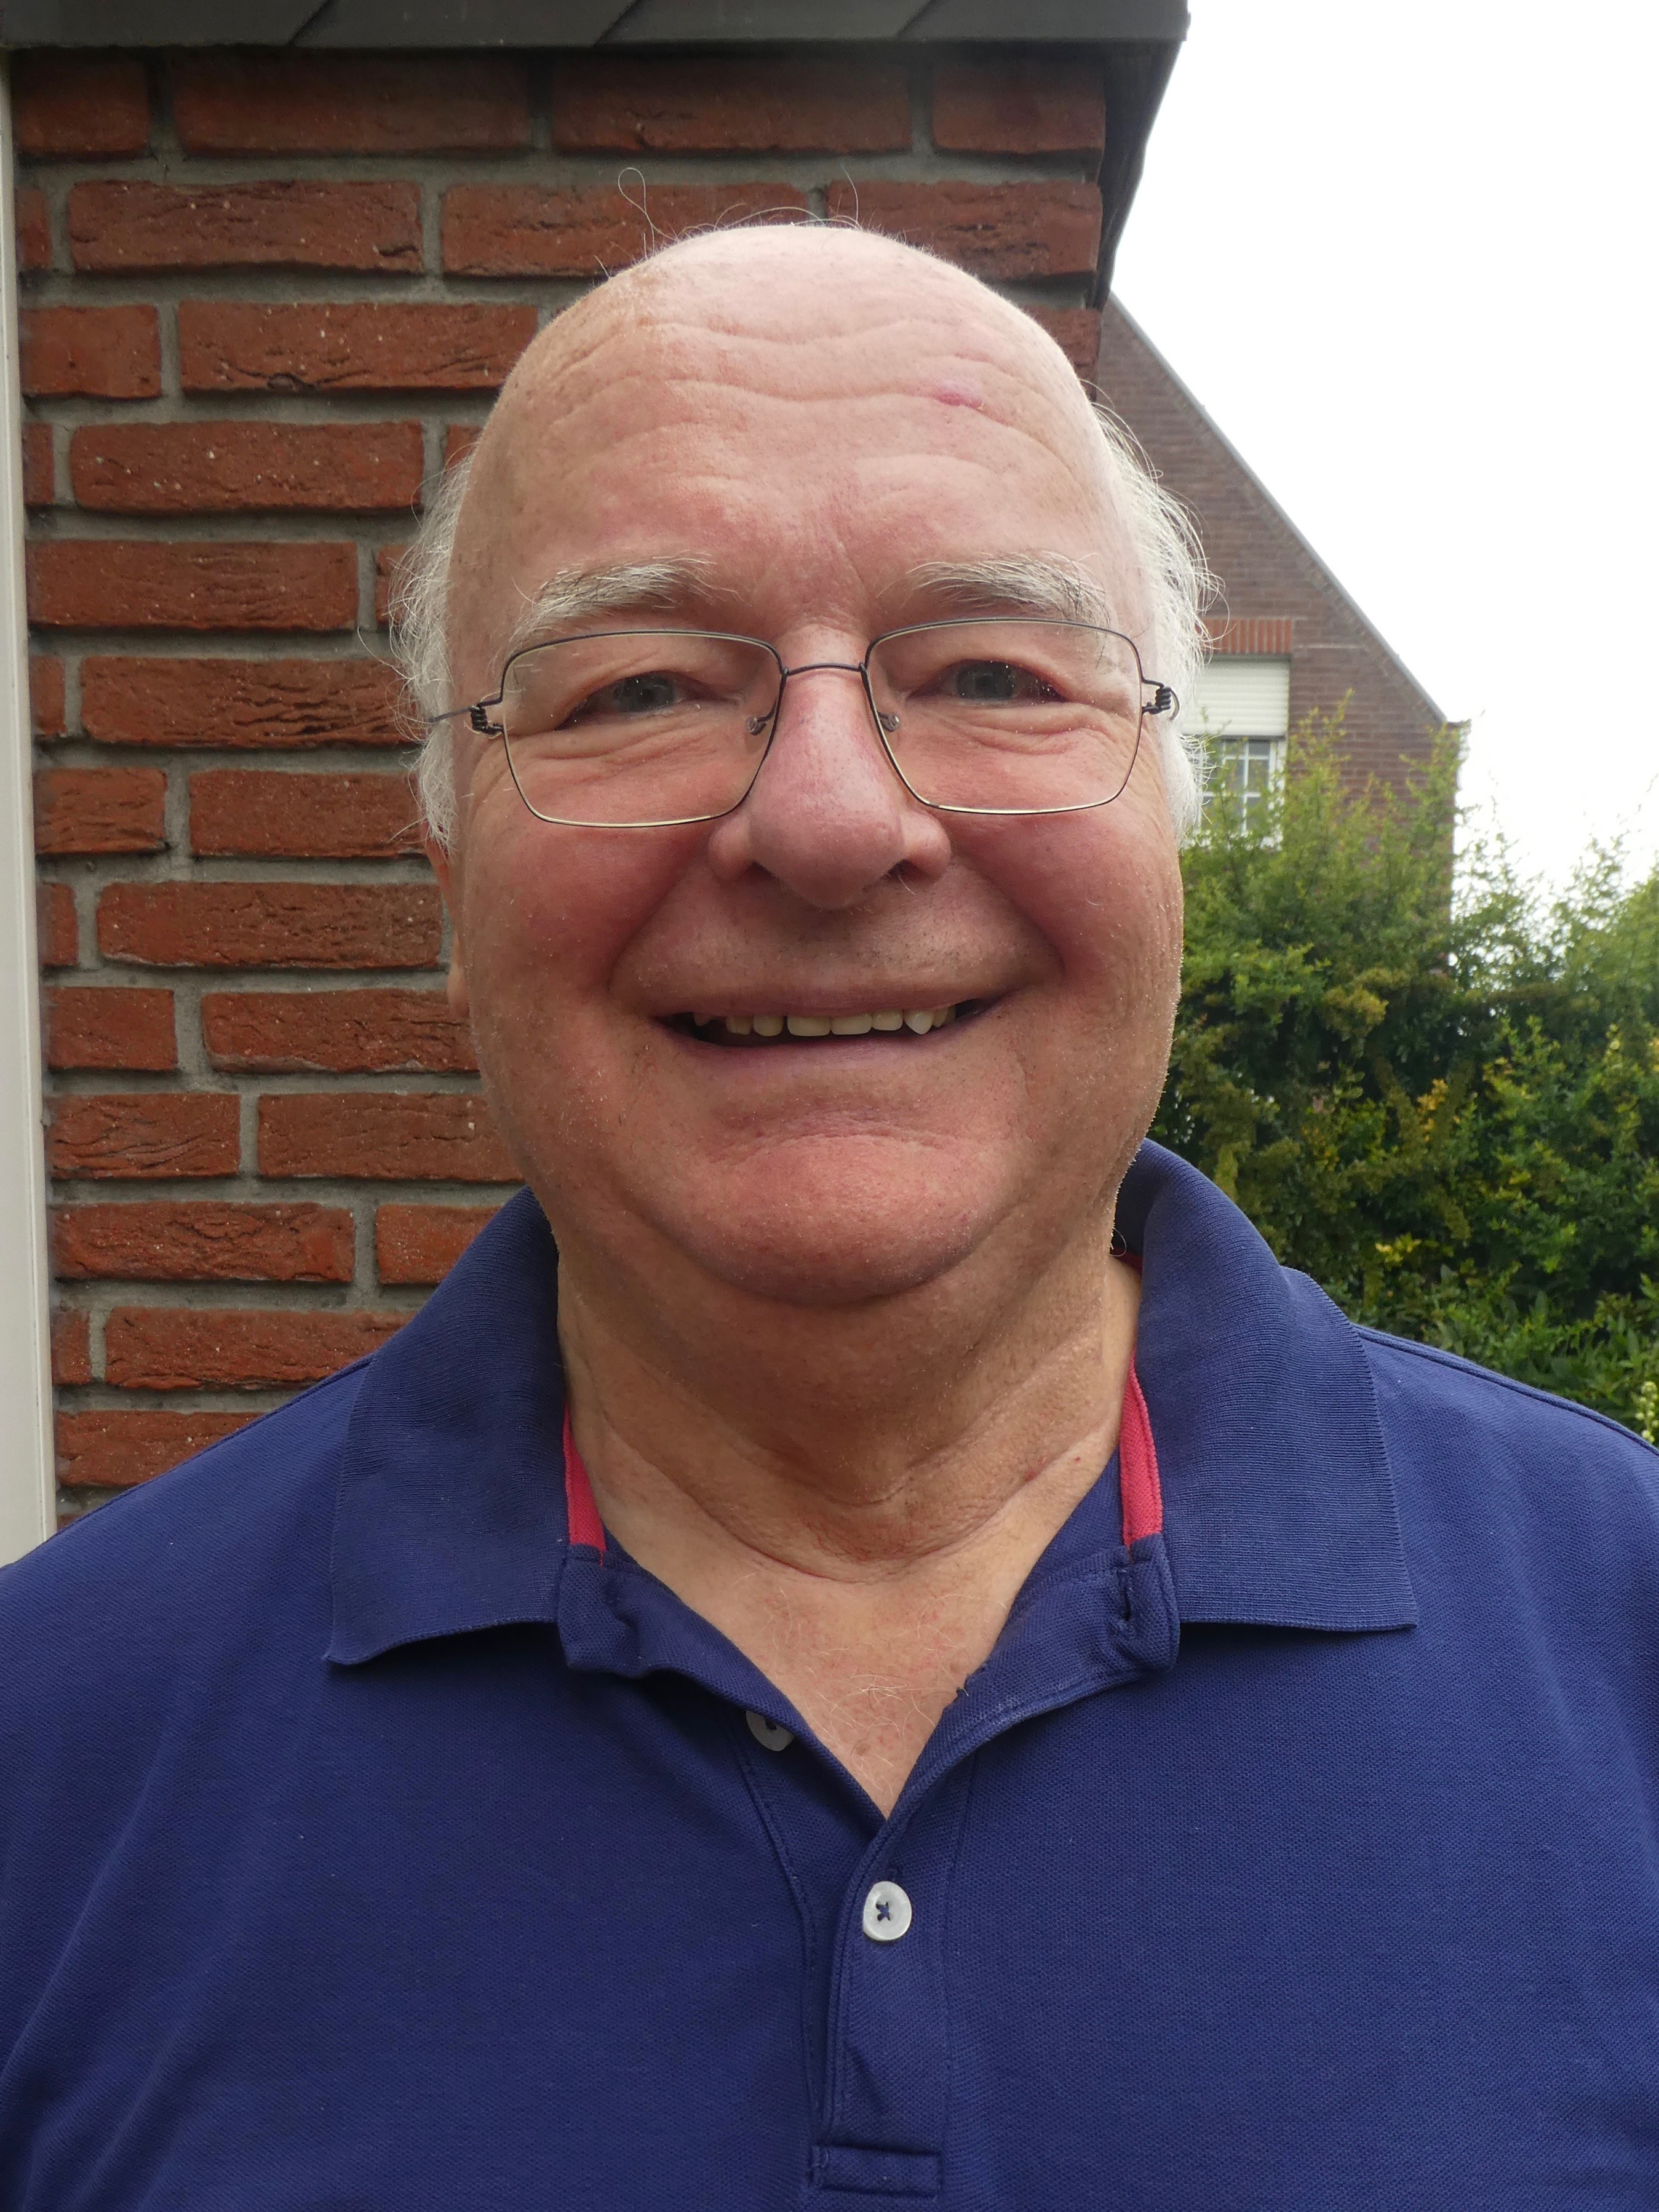 Manfred Wiese